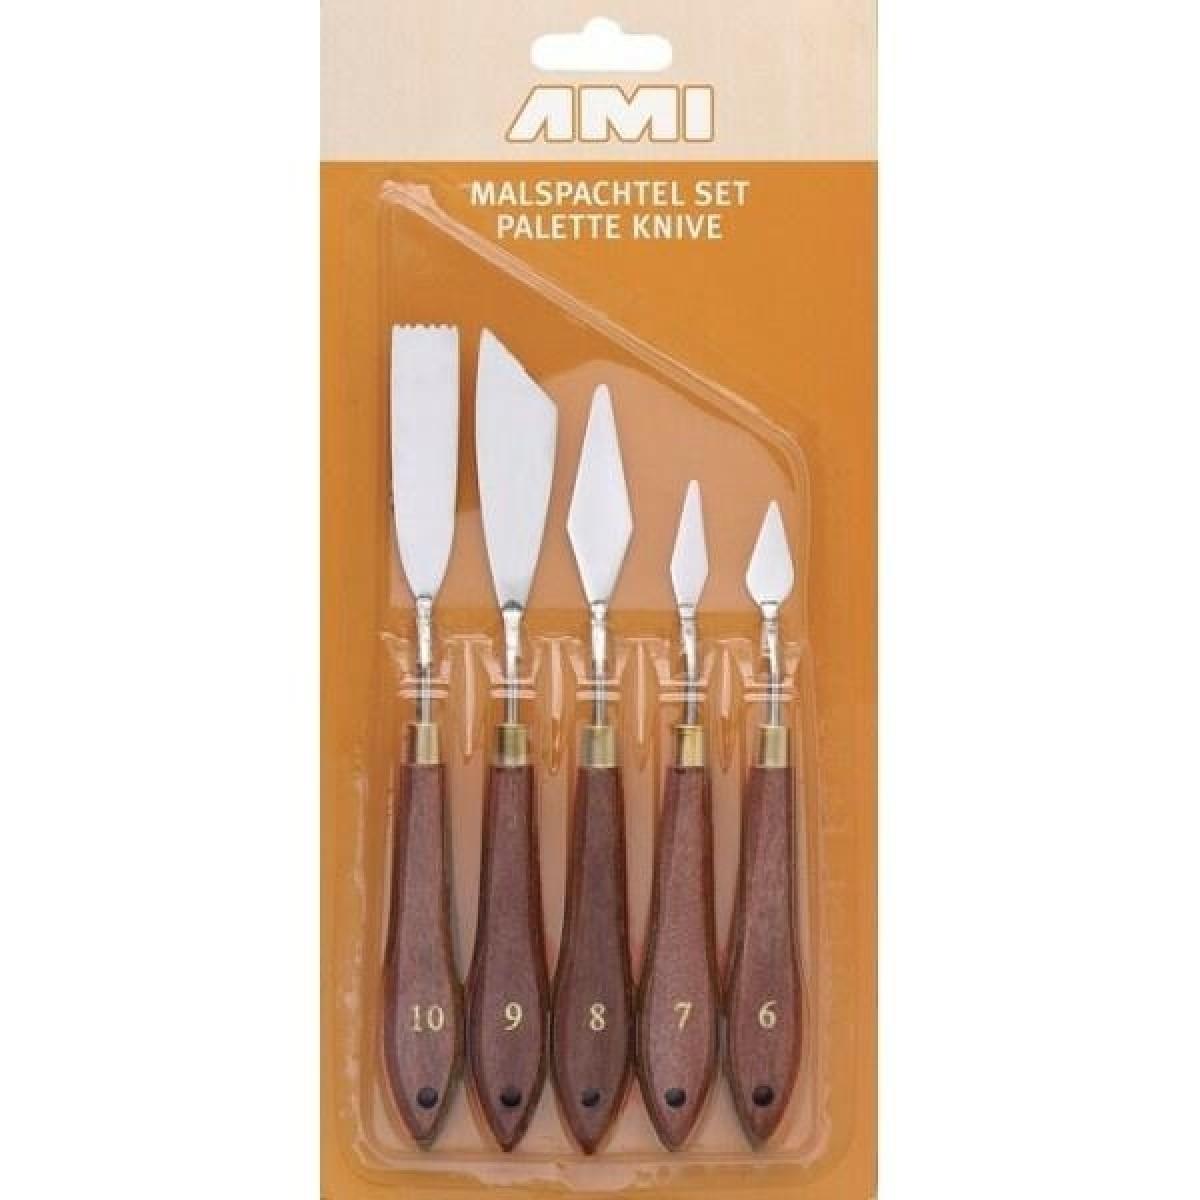 Paletknive sæt, 5 stk. no. 6 -10